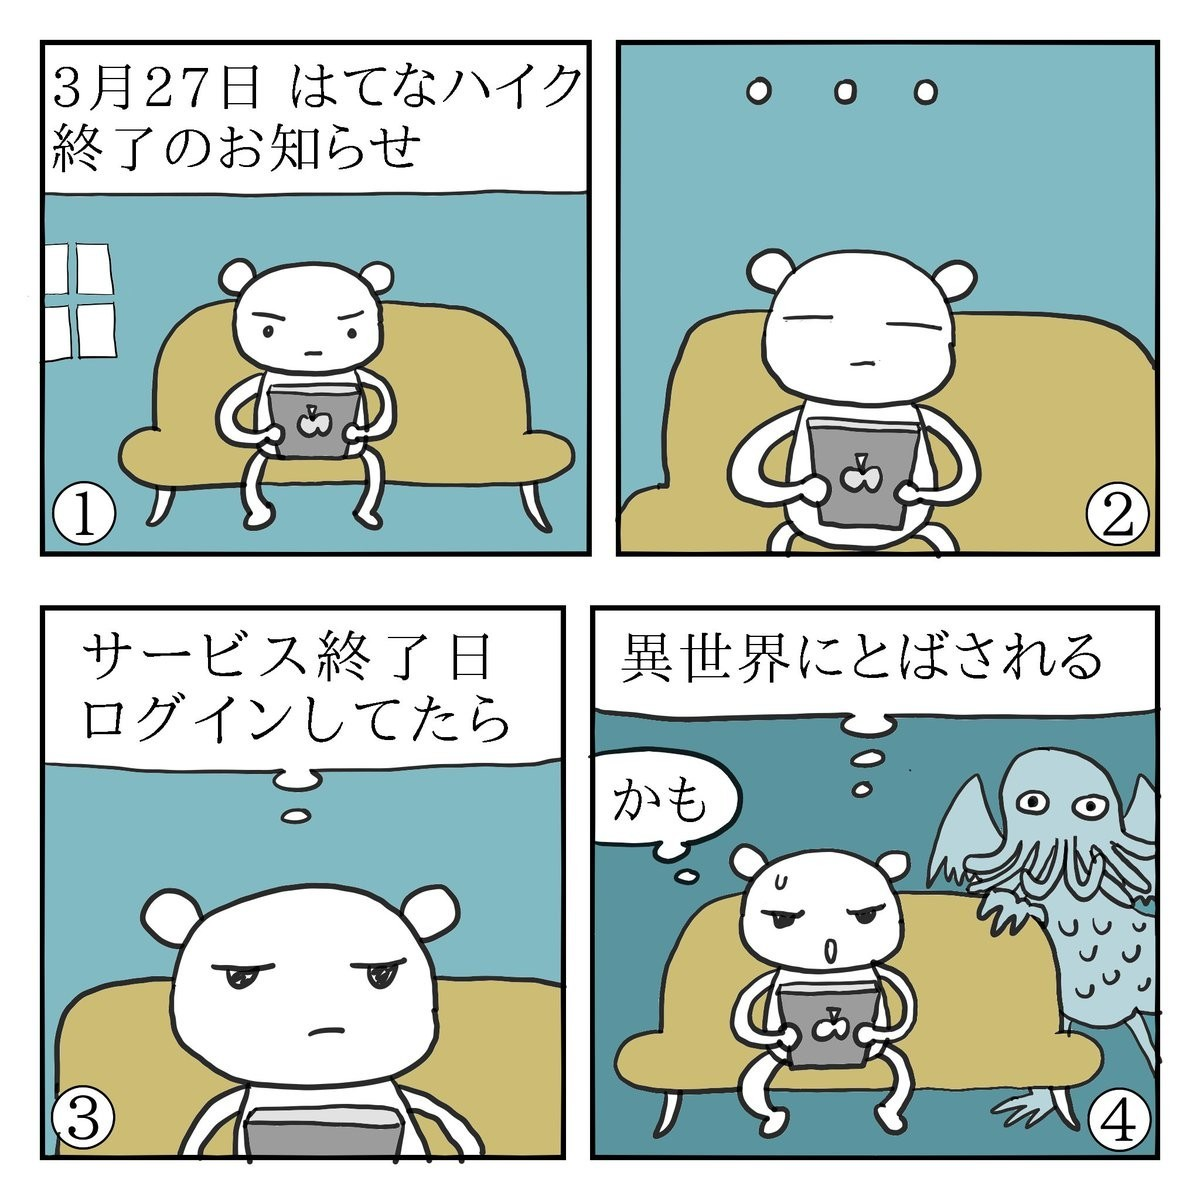 f:id:kanarihikokuma:20190318070004j:image:w330